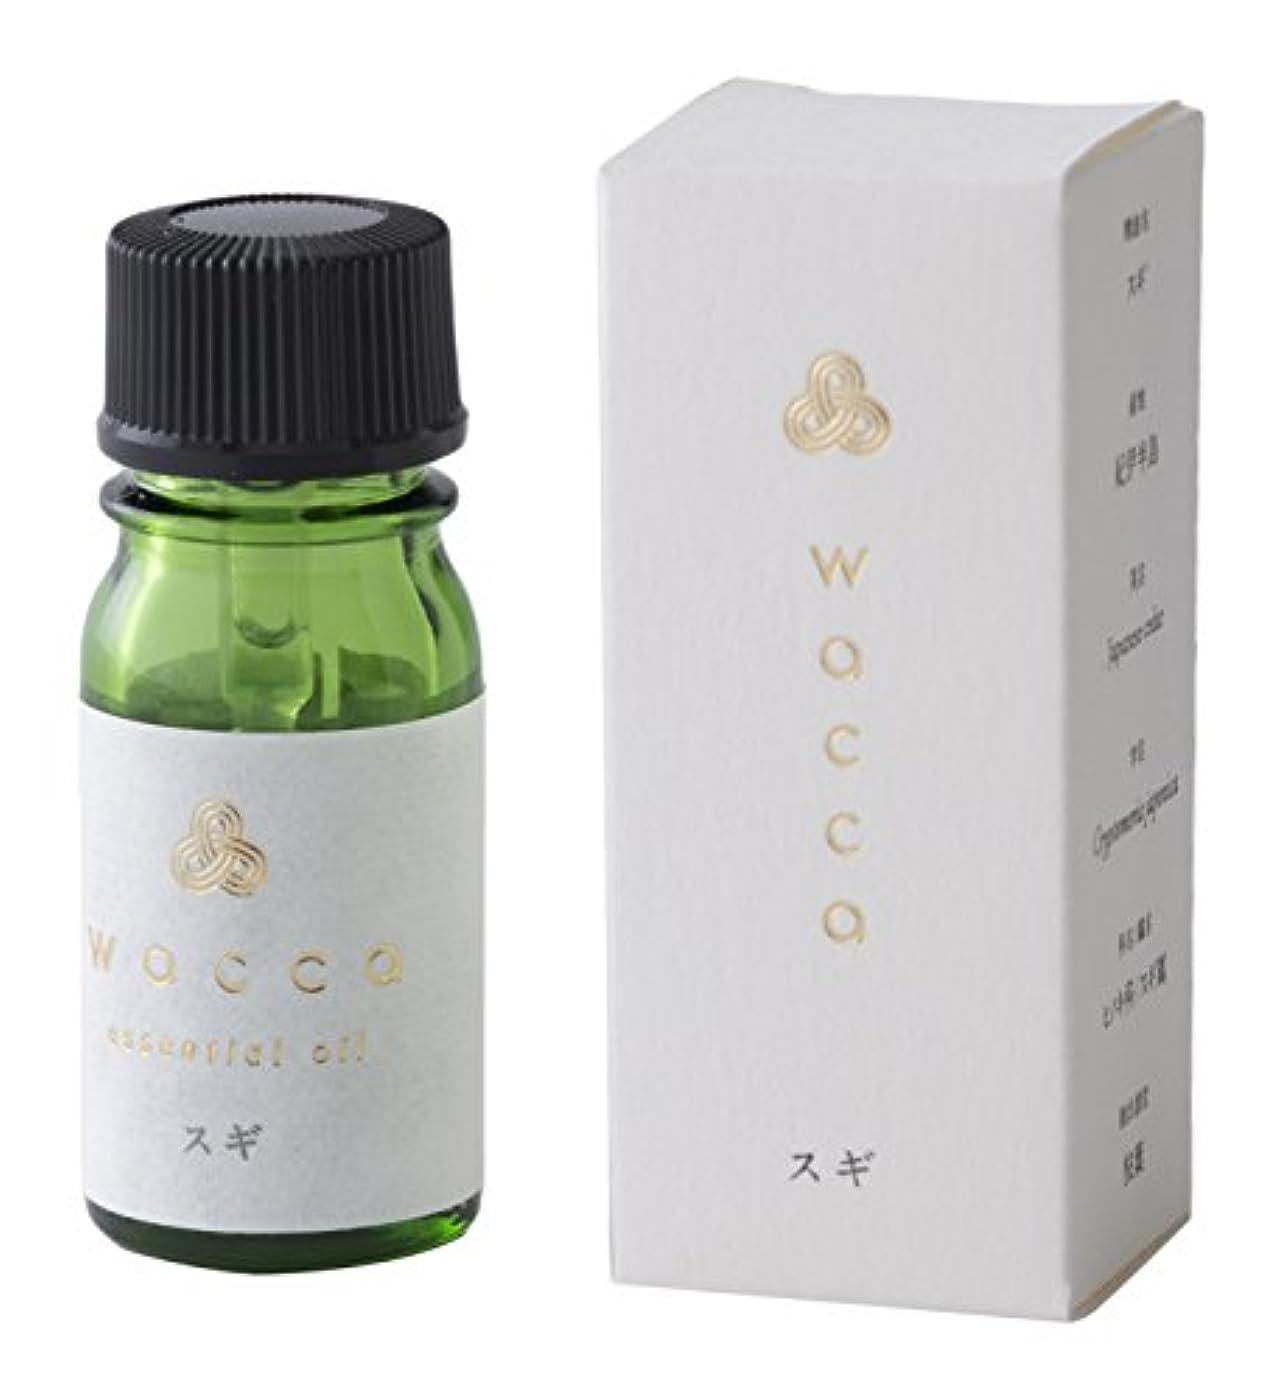 wacca ワッカ エッセンシャルオイル 5ml 杉 スギ Japanese cedar essential oil 和精油 KUSU HANDMADE